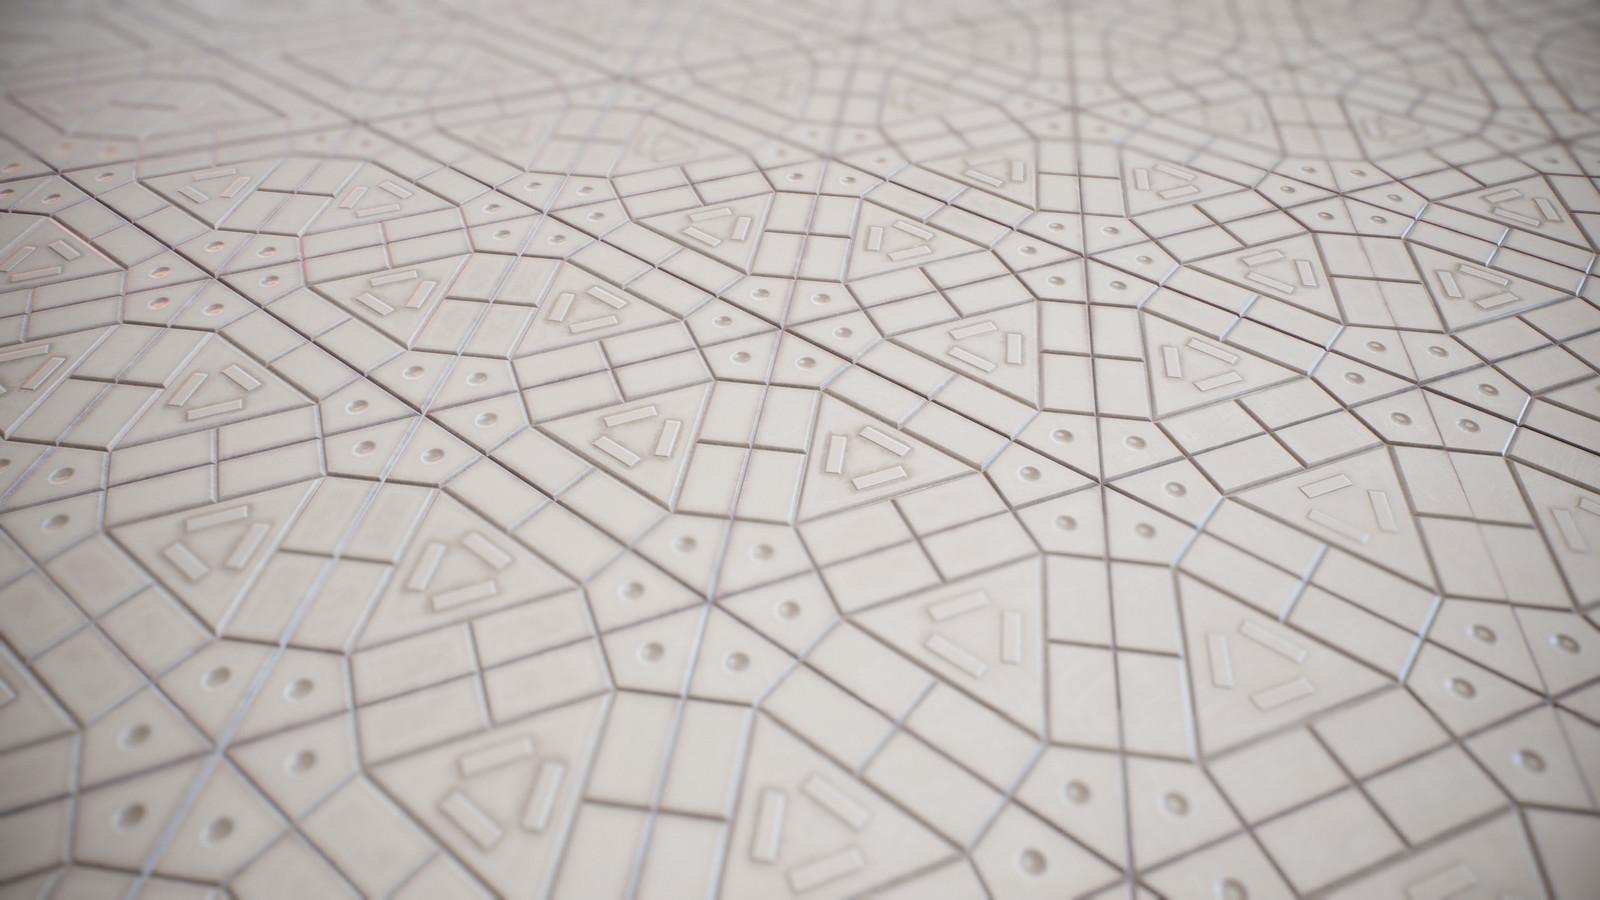 Triangular plastic ground tiled